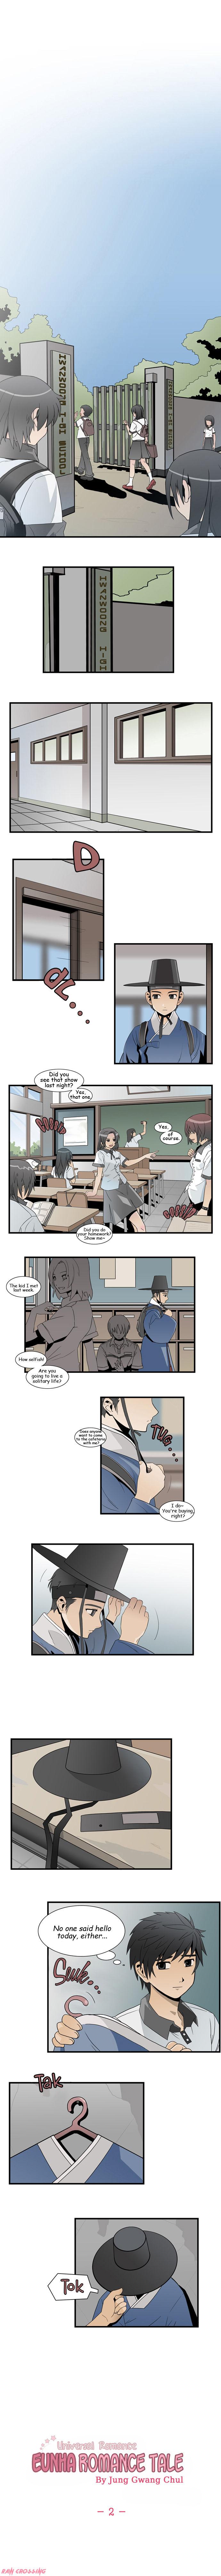 Eunha Romance Tale 2 Page 2